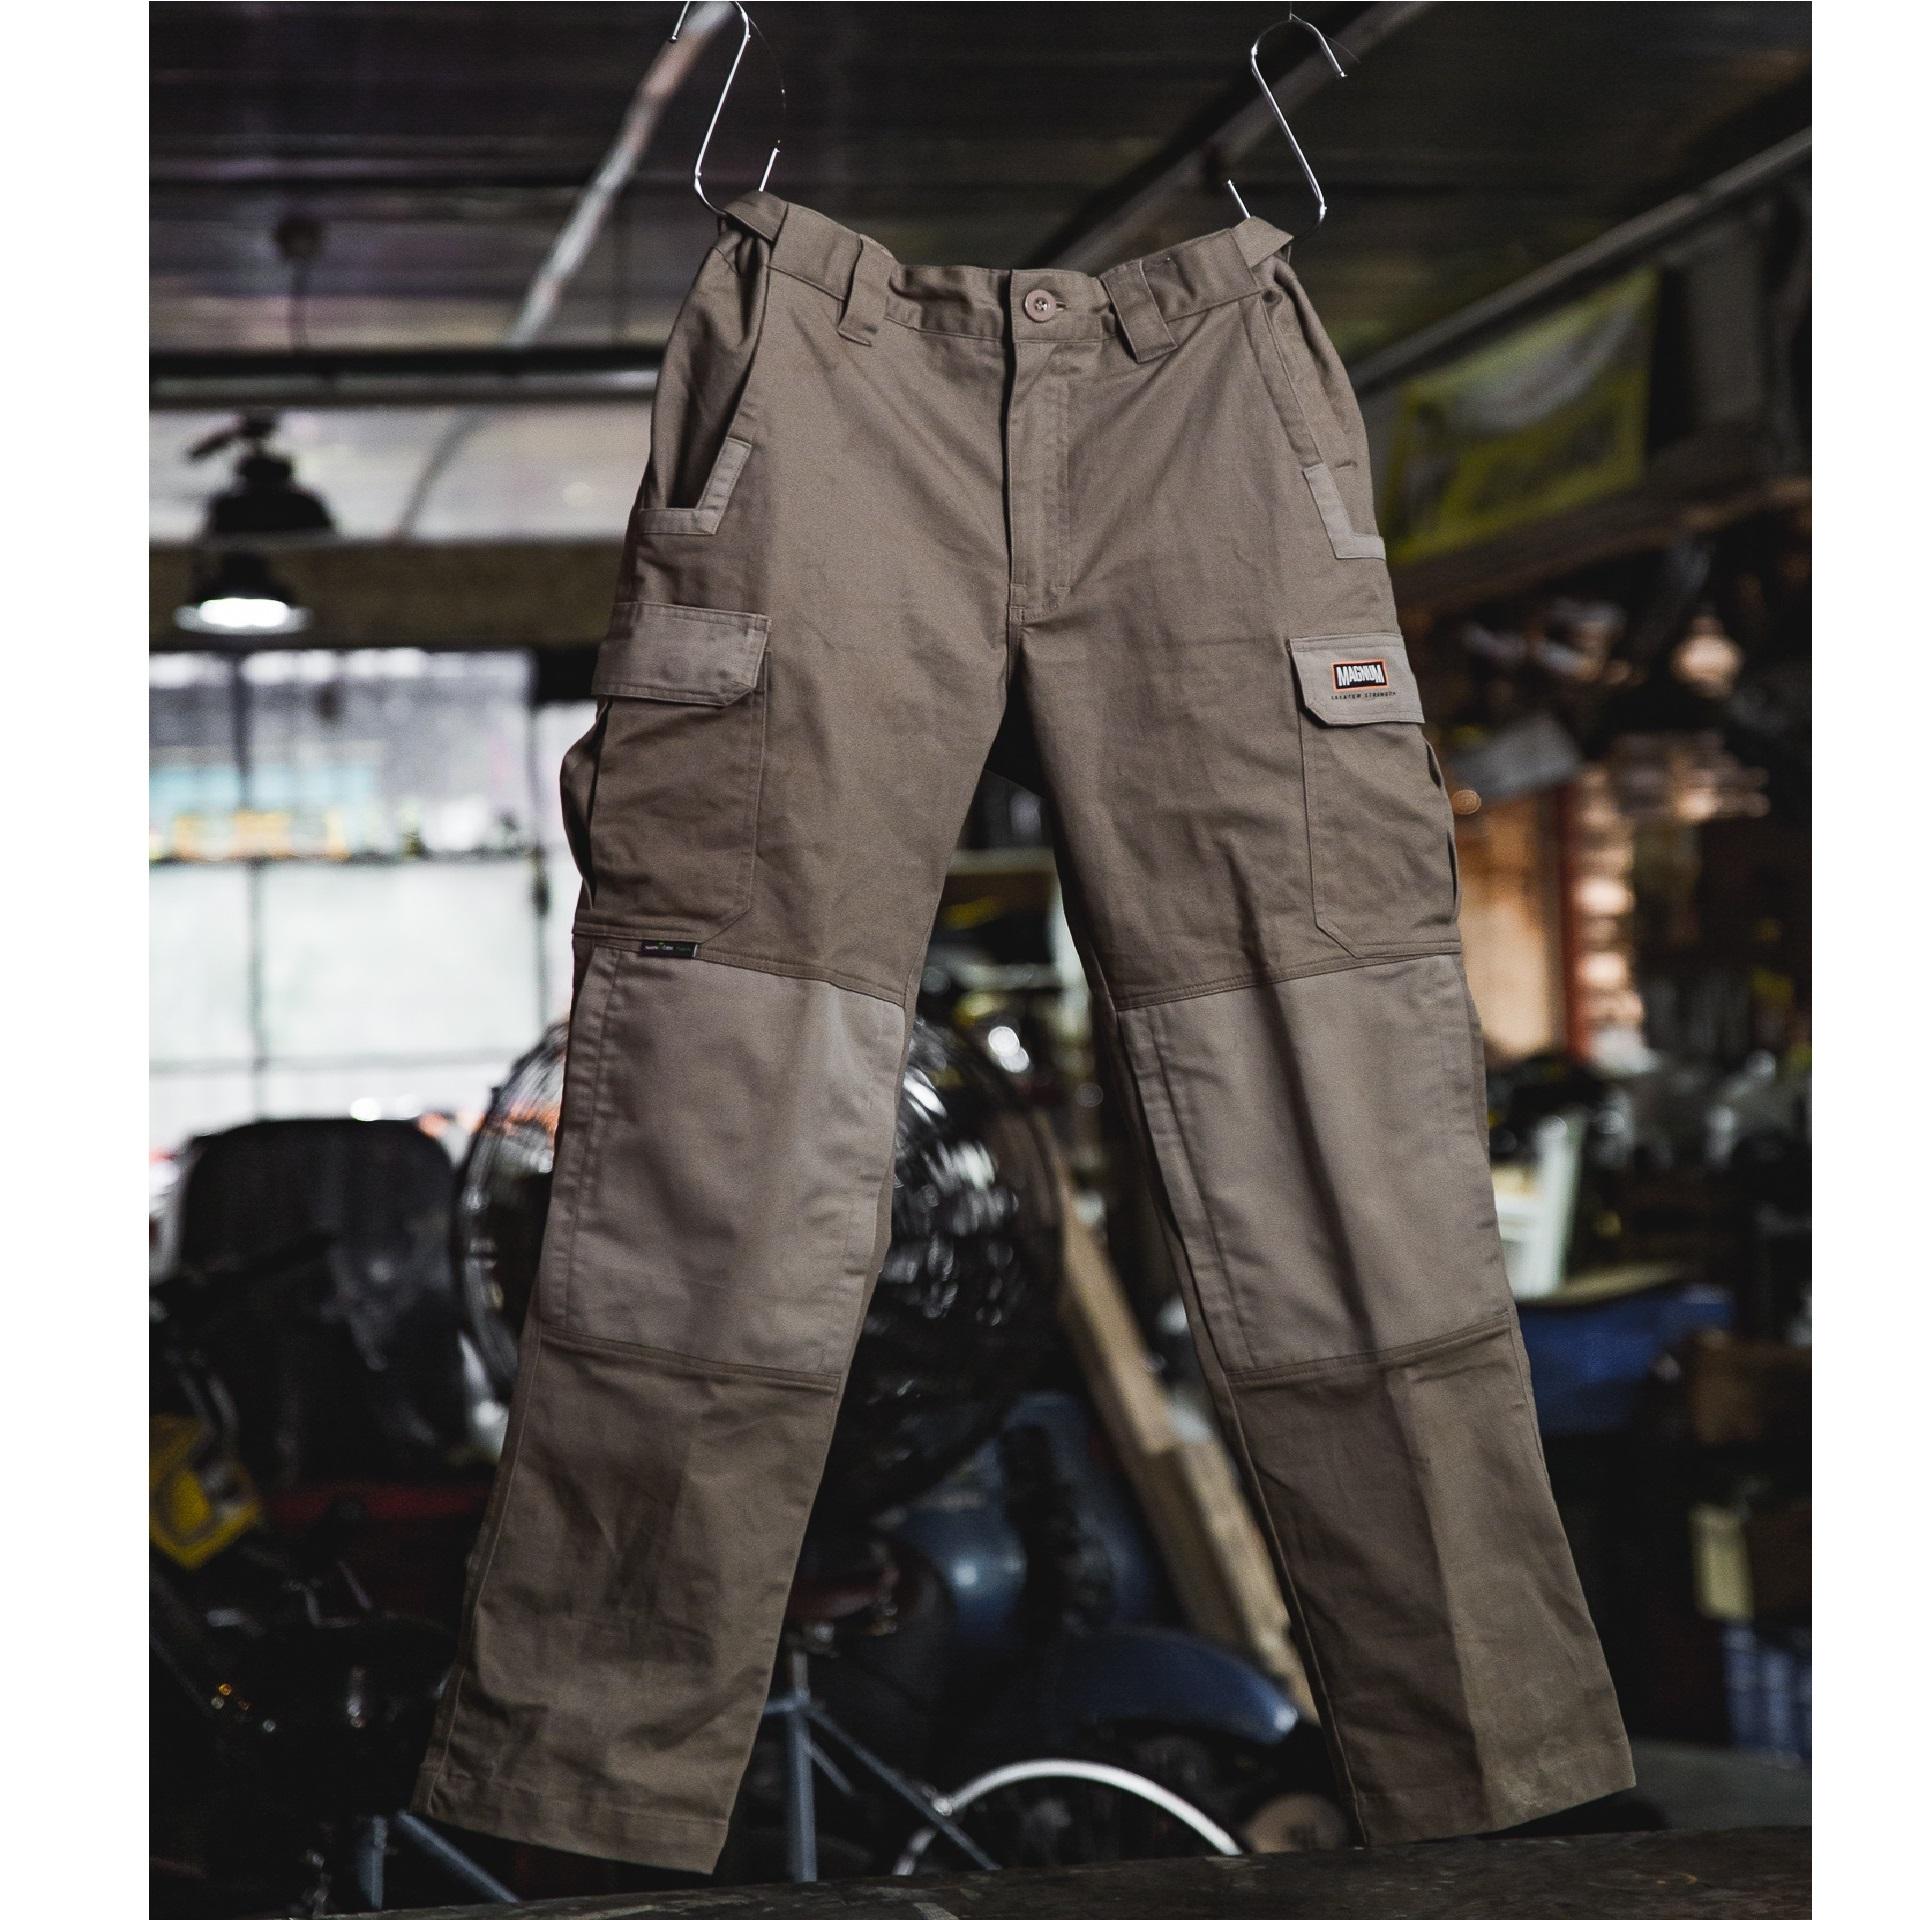 magnum_workwear_web-283